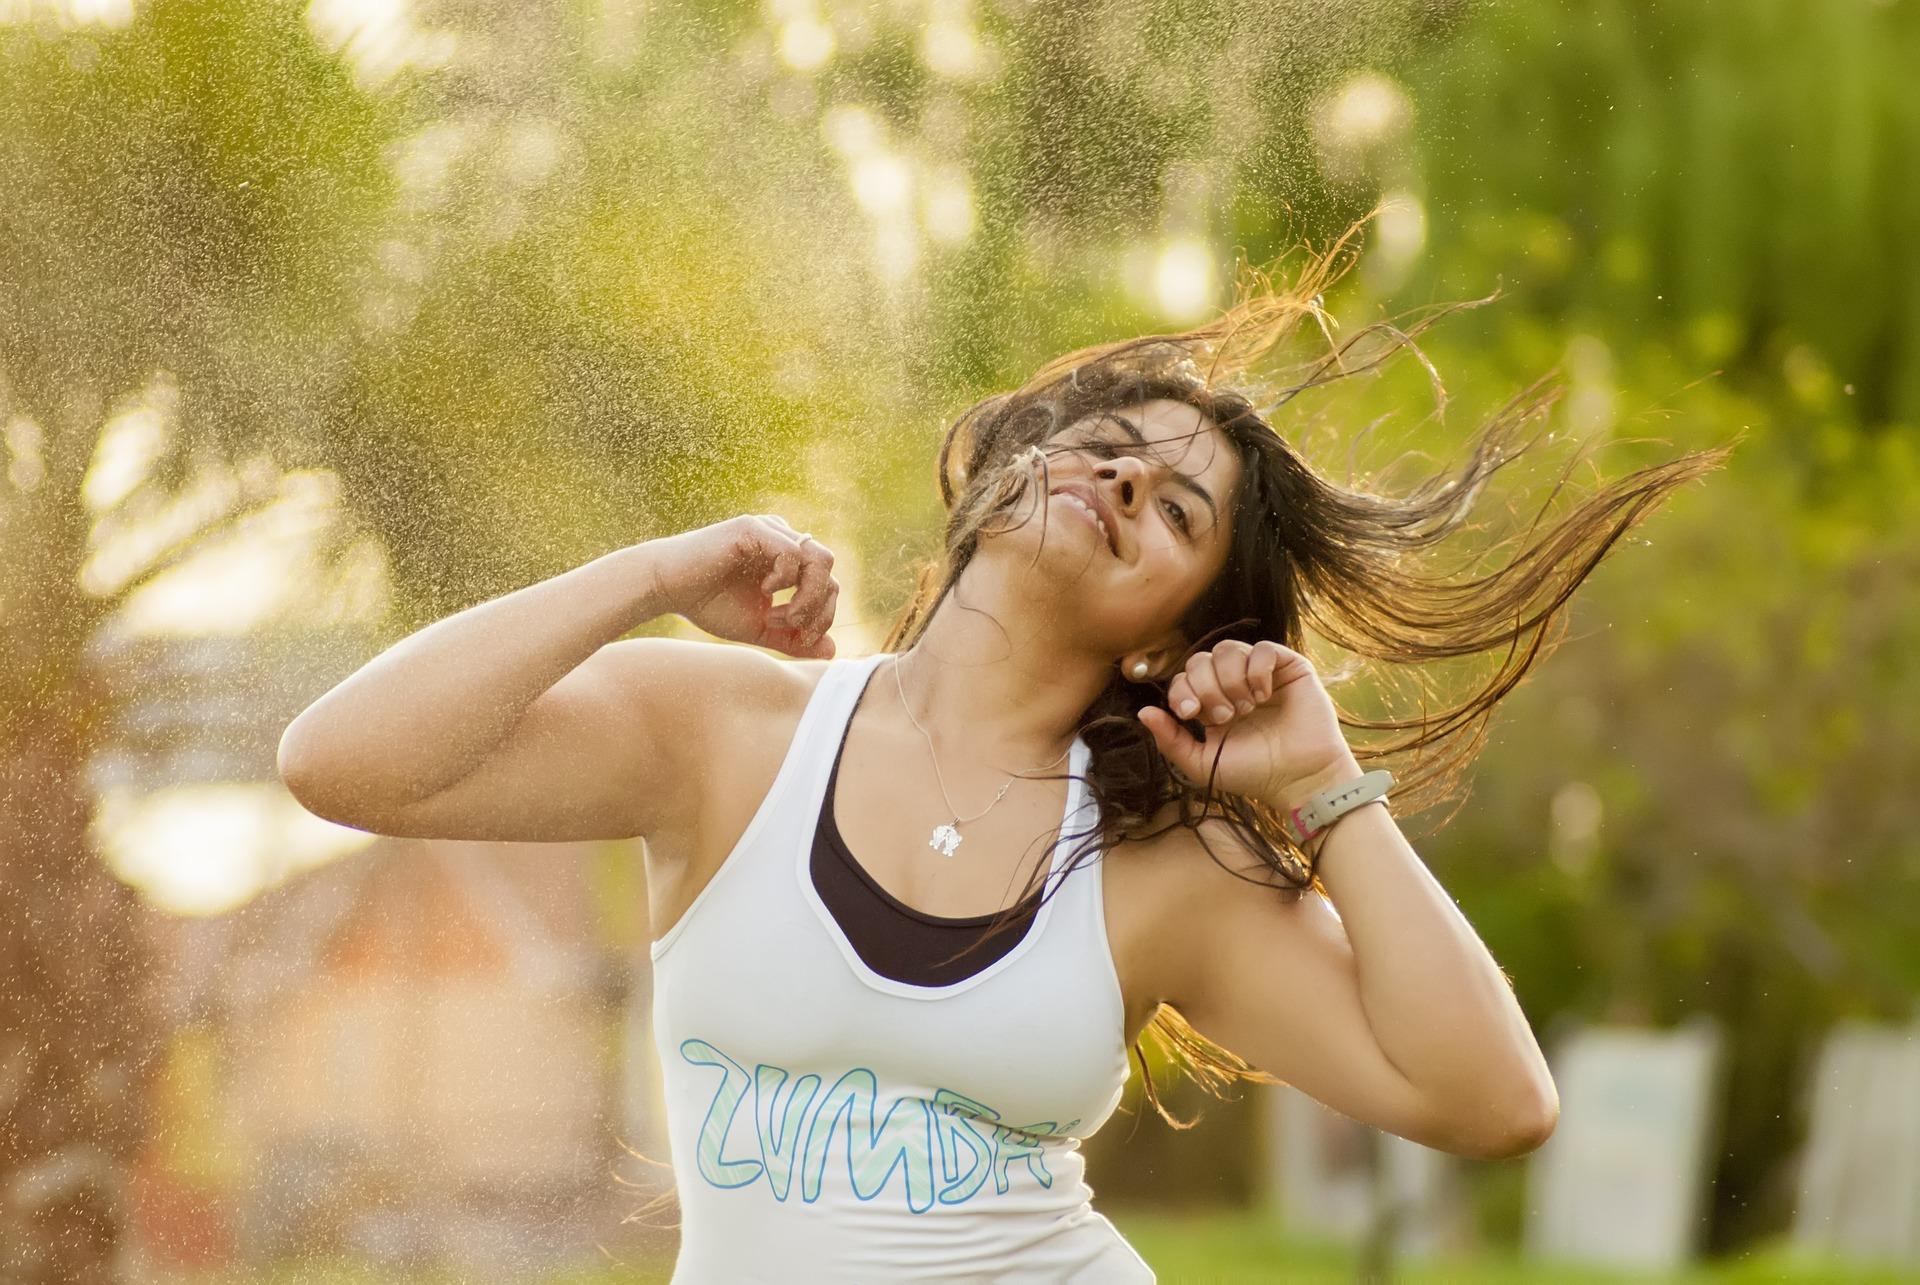 Zumba Fitness (Bild: pixabay/voltamax)